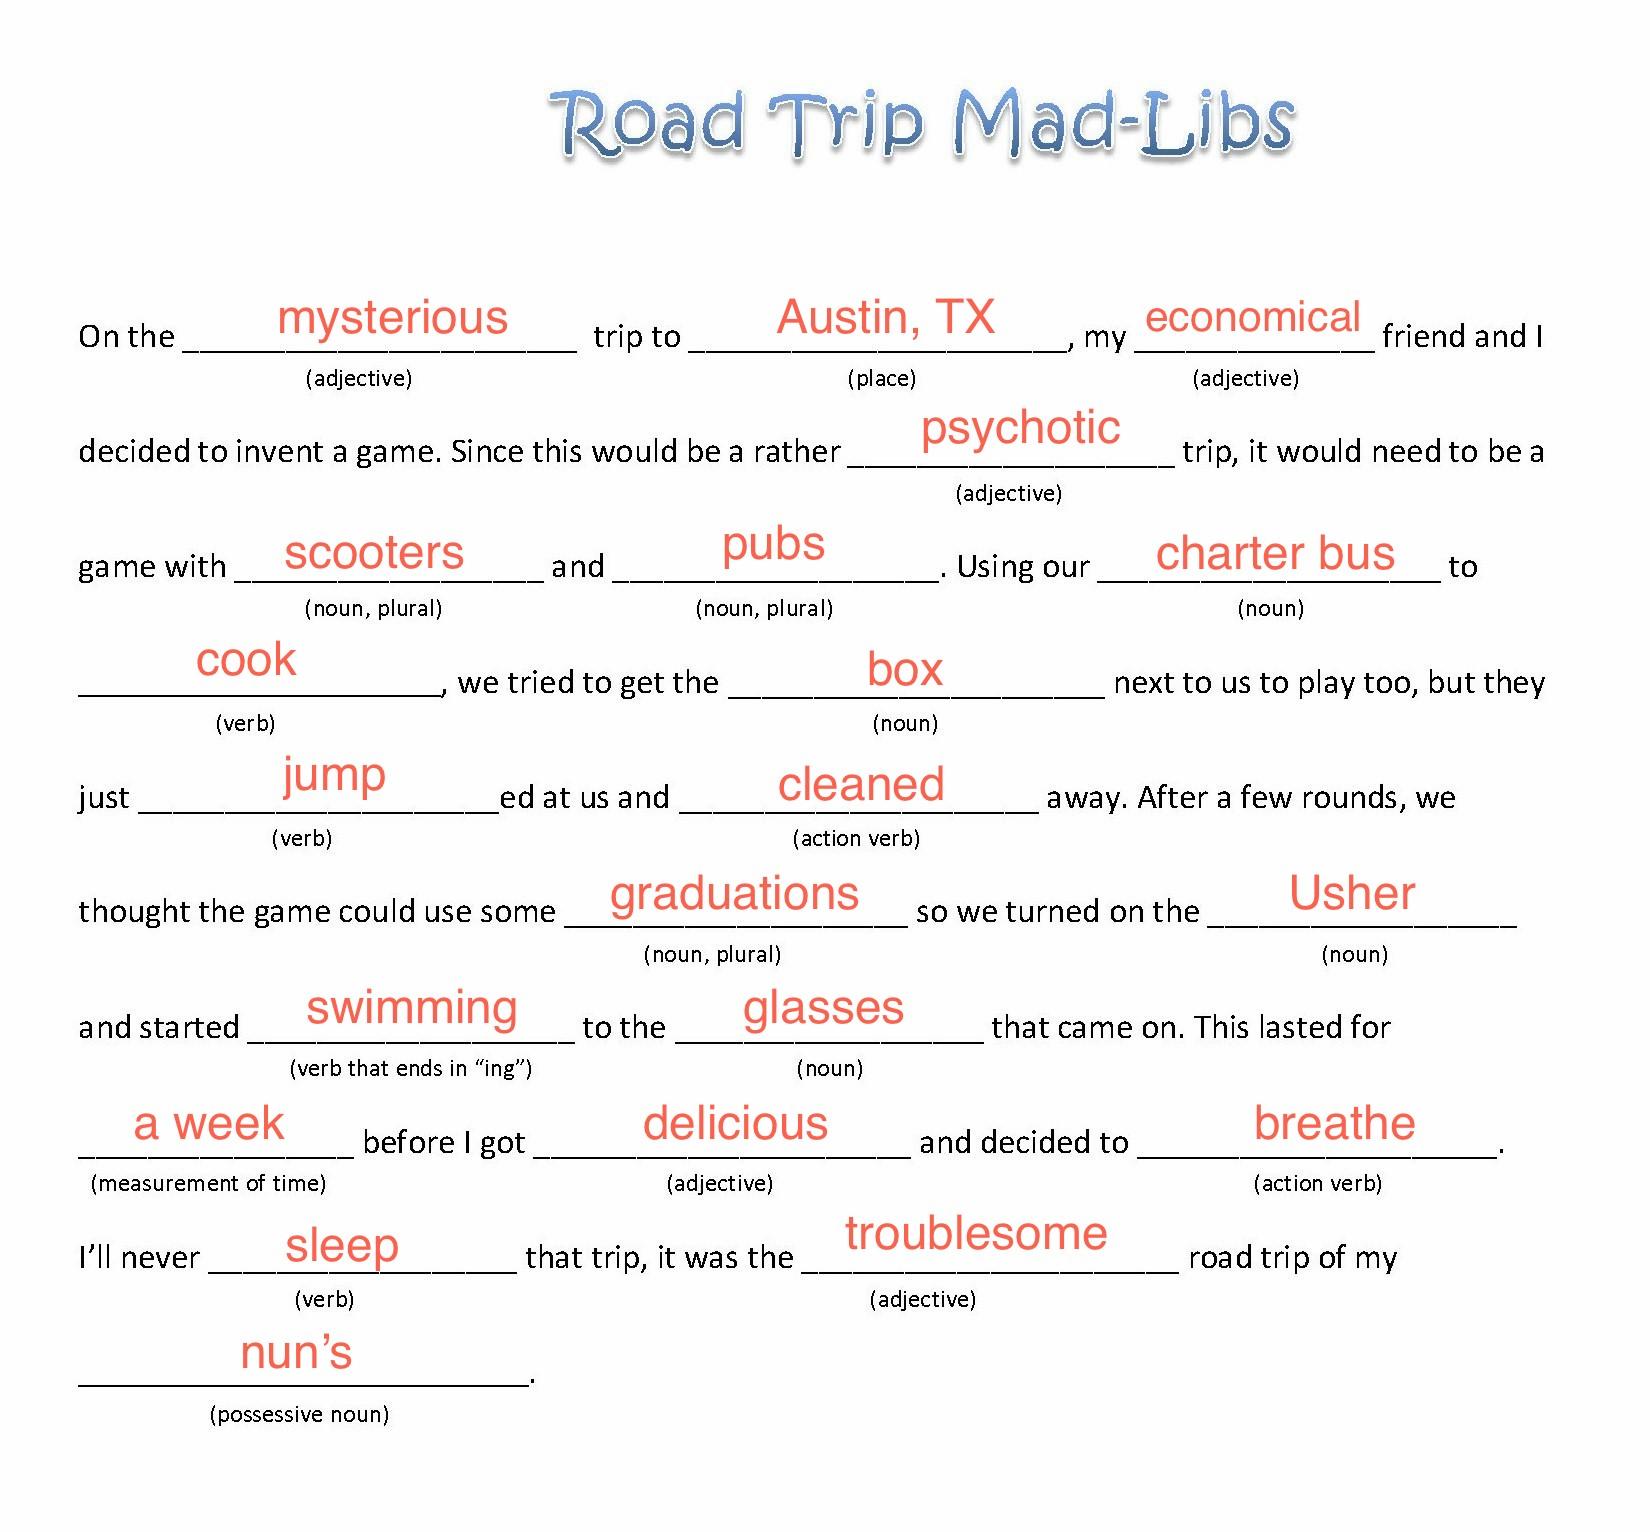 Epic Road Trip Mad Libs